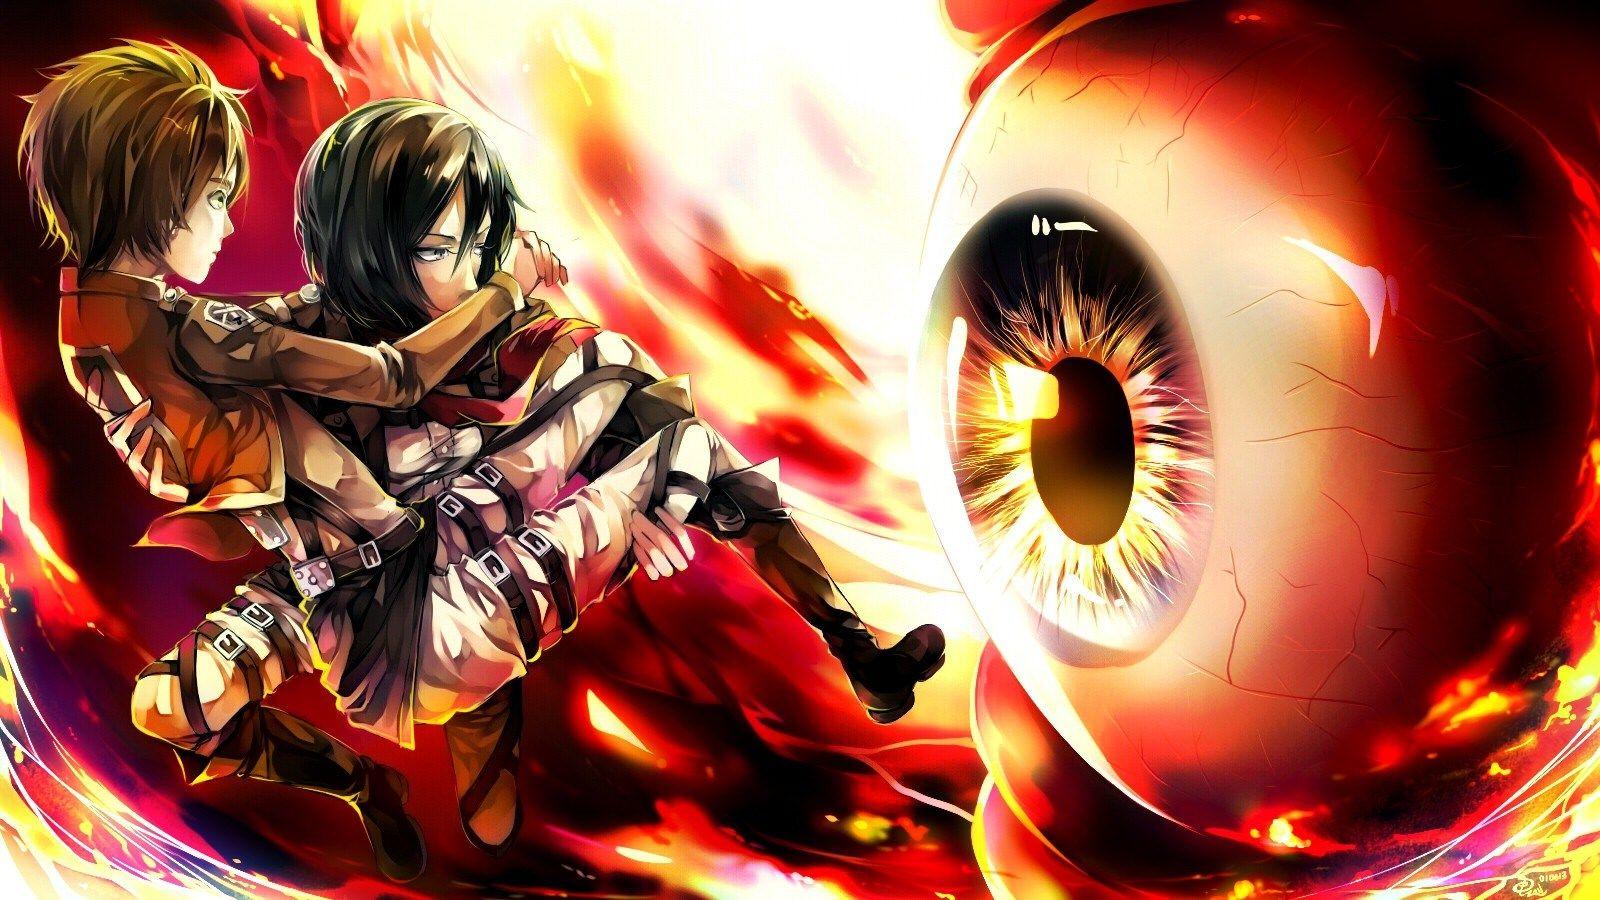 1600x900 Px Attack On Titan Image 1080p High Quality By Raleigh Longman Heros Attaque Des Titans Type De Manga